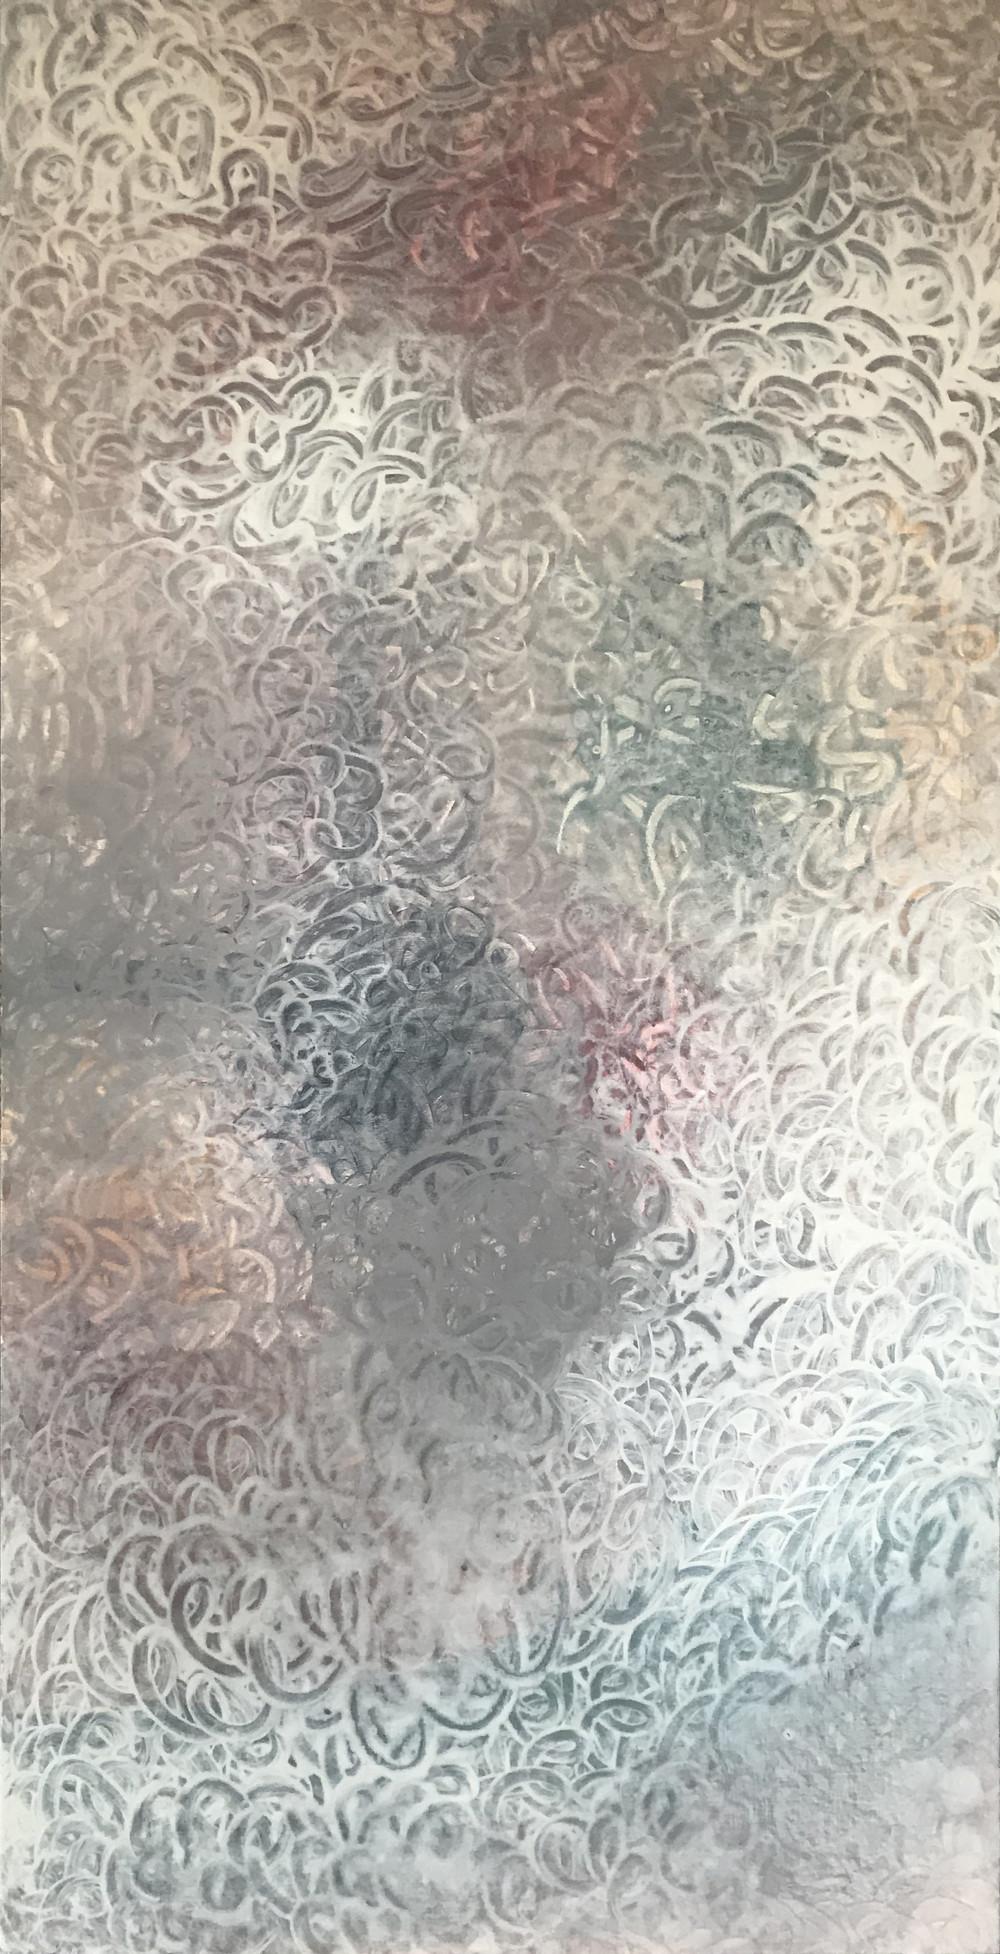 Роспись, живопись «Живопись», роспись живопись, фото из проекта